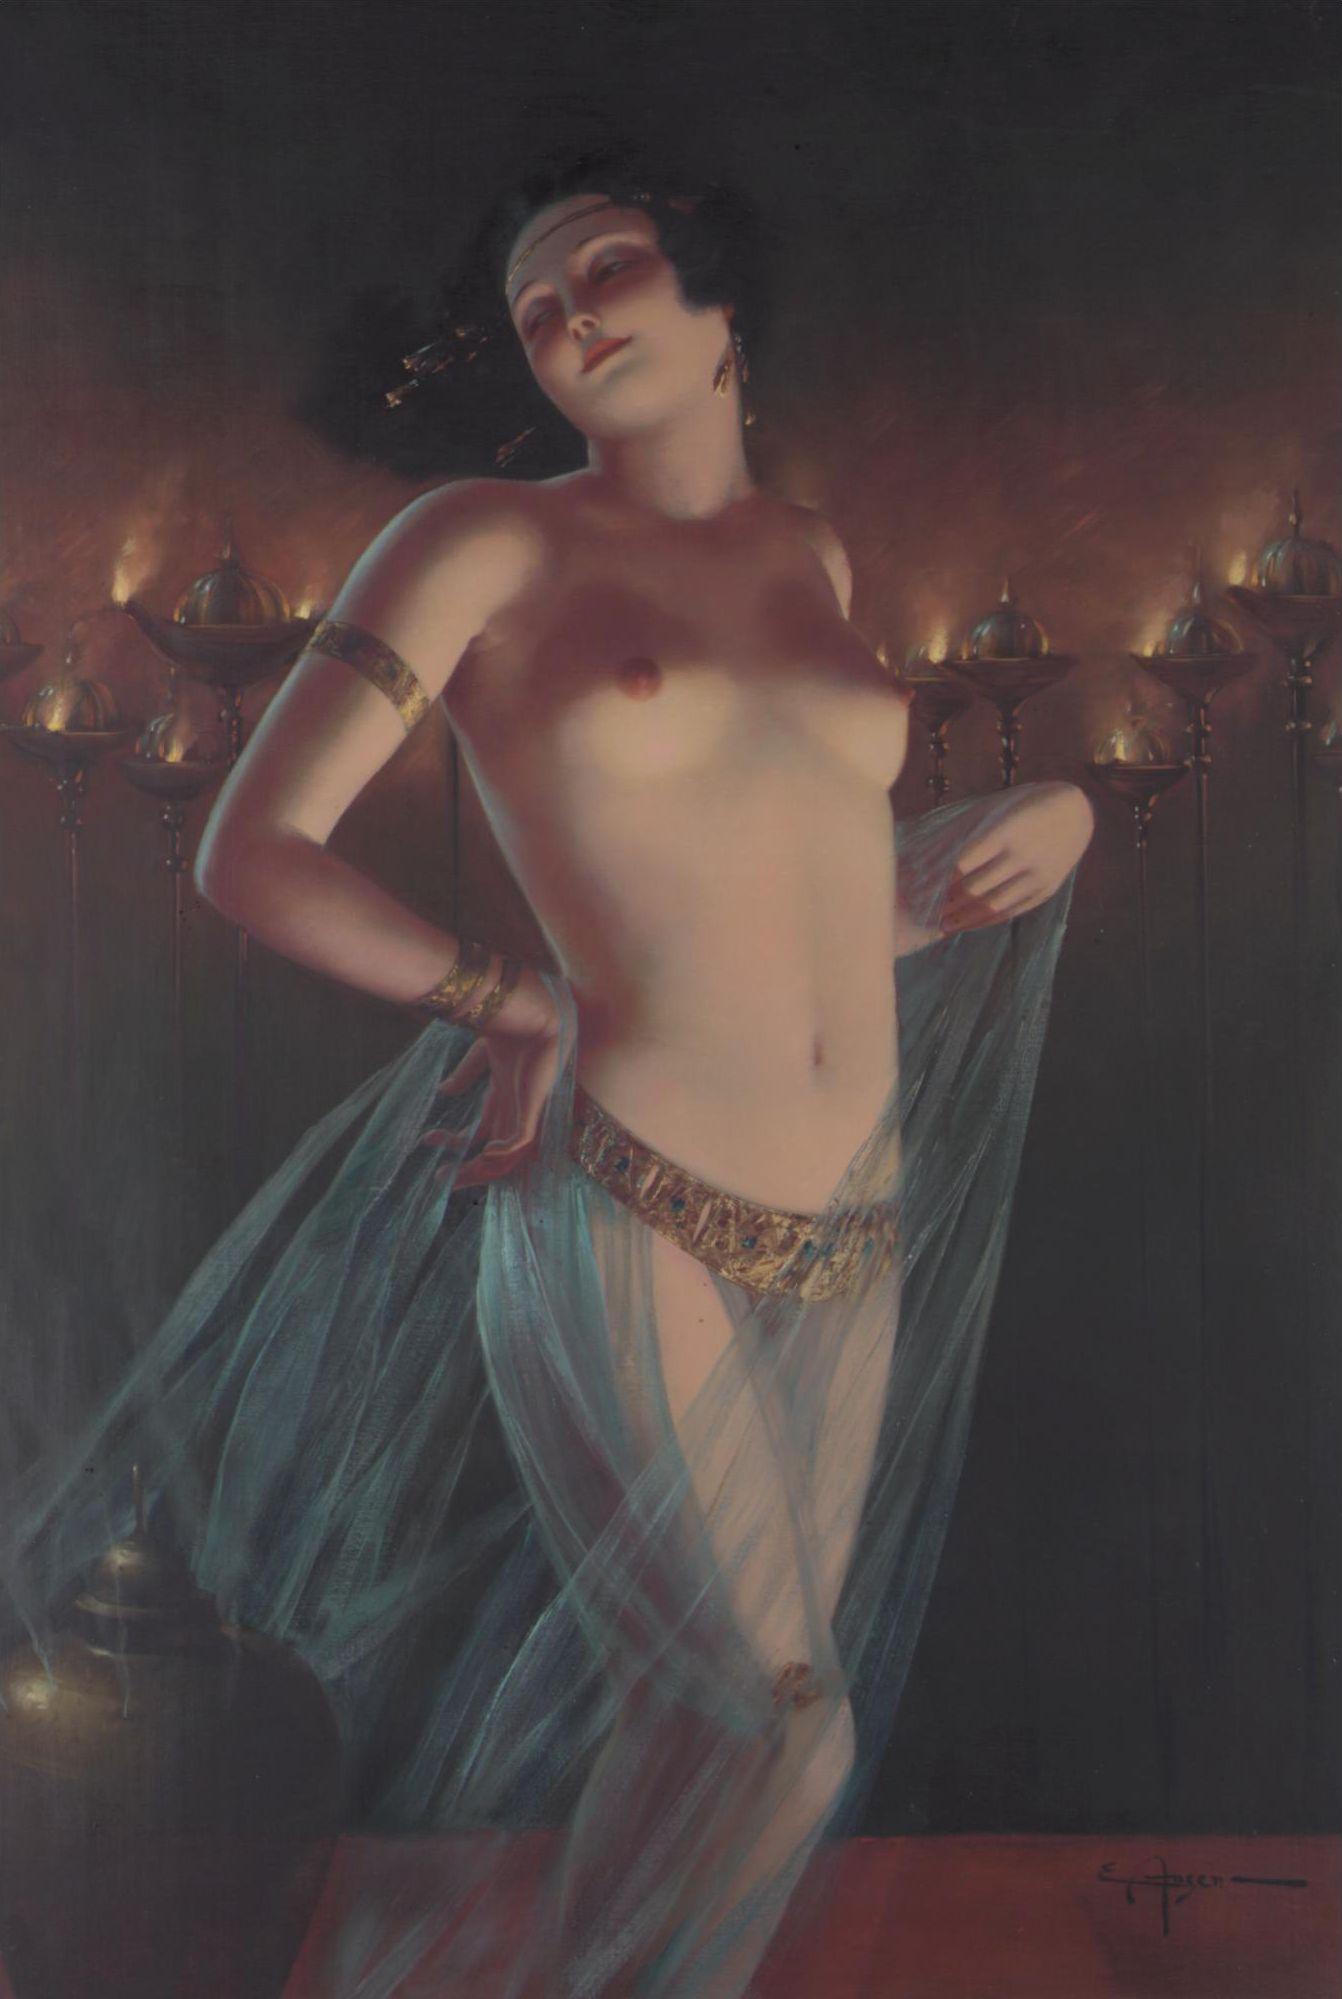 Eduard Ansen-Hofmann, 1820-1904. Прекрасная танцовщица. 100 х 71 см. Частная коллекция